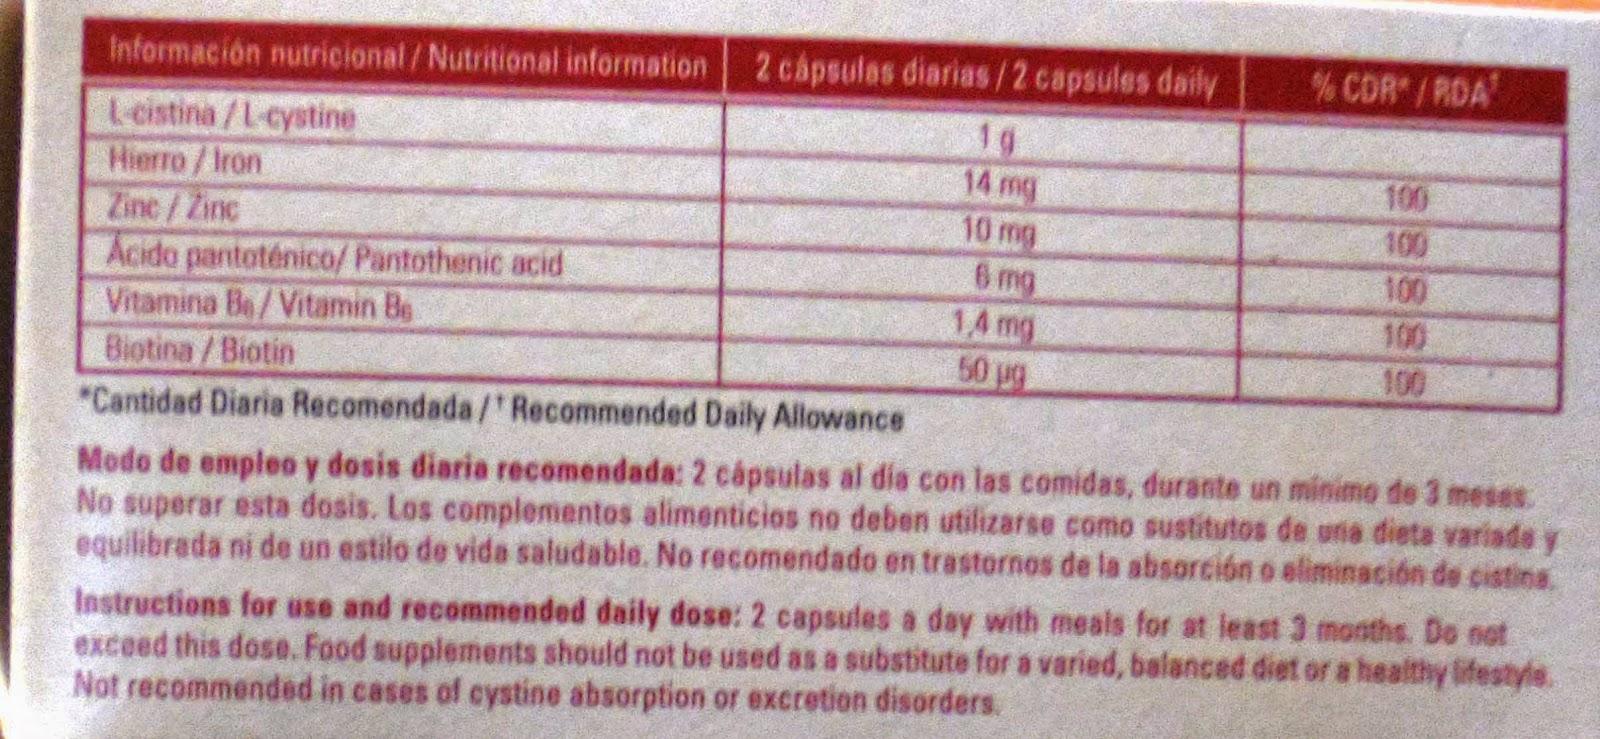 vitacrecil forte ingredientes composicion